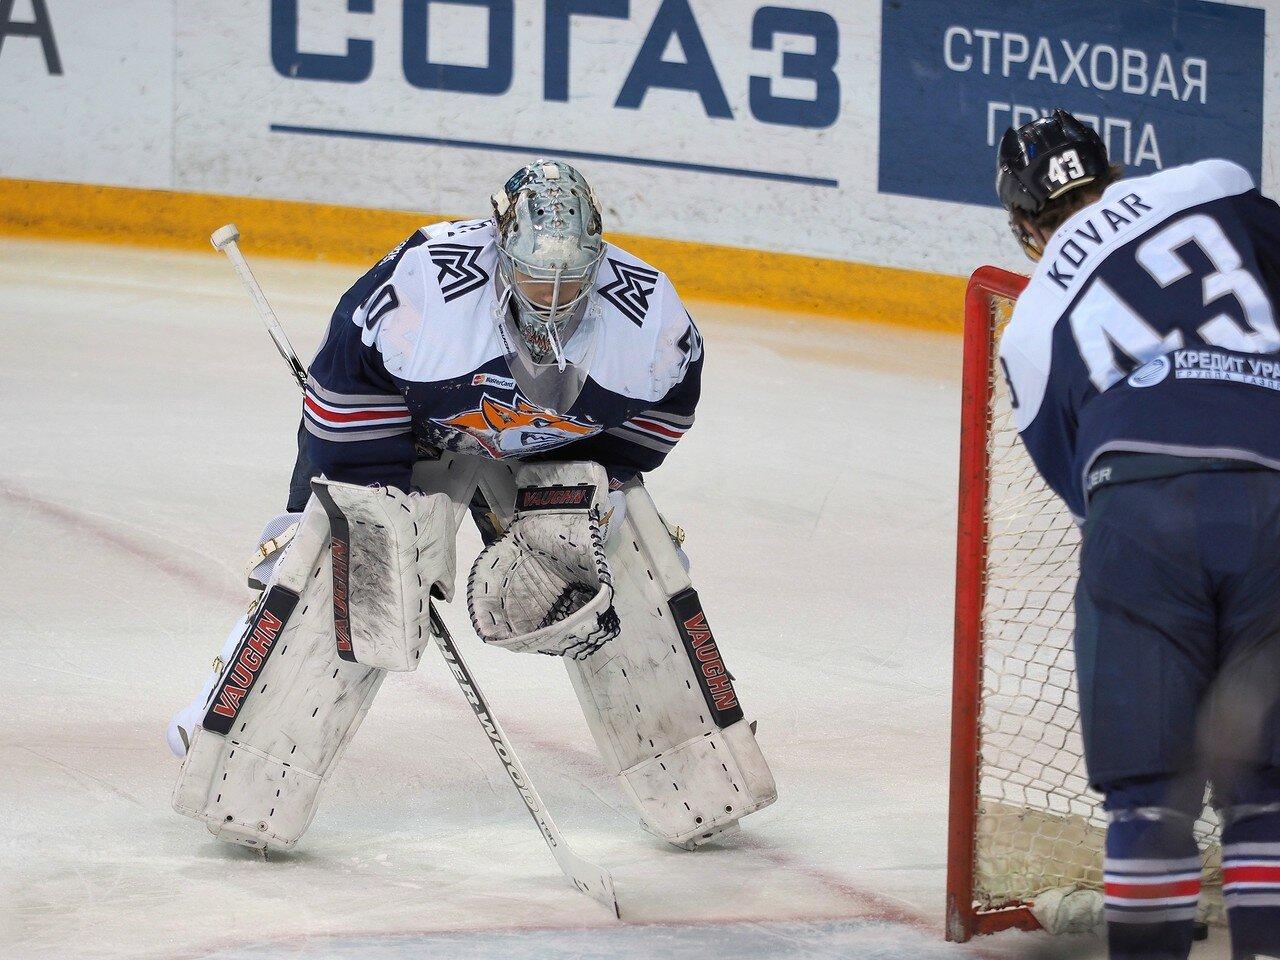 43Плей-офф 2016 Восток Финал Металлург - Салават Юлаев 23.03.2016